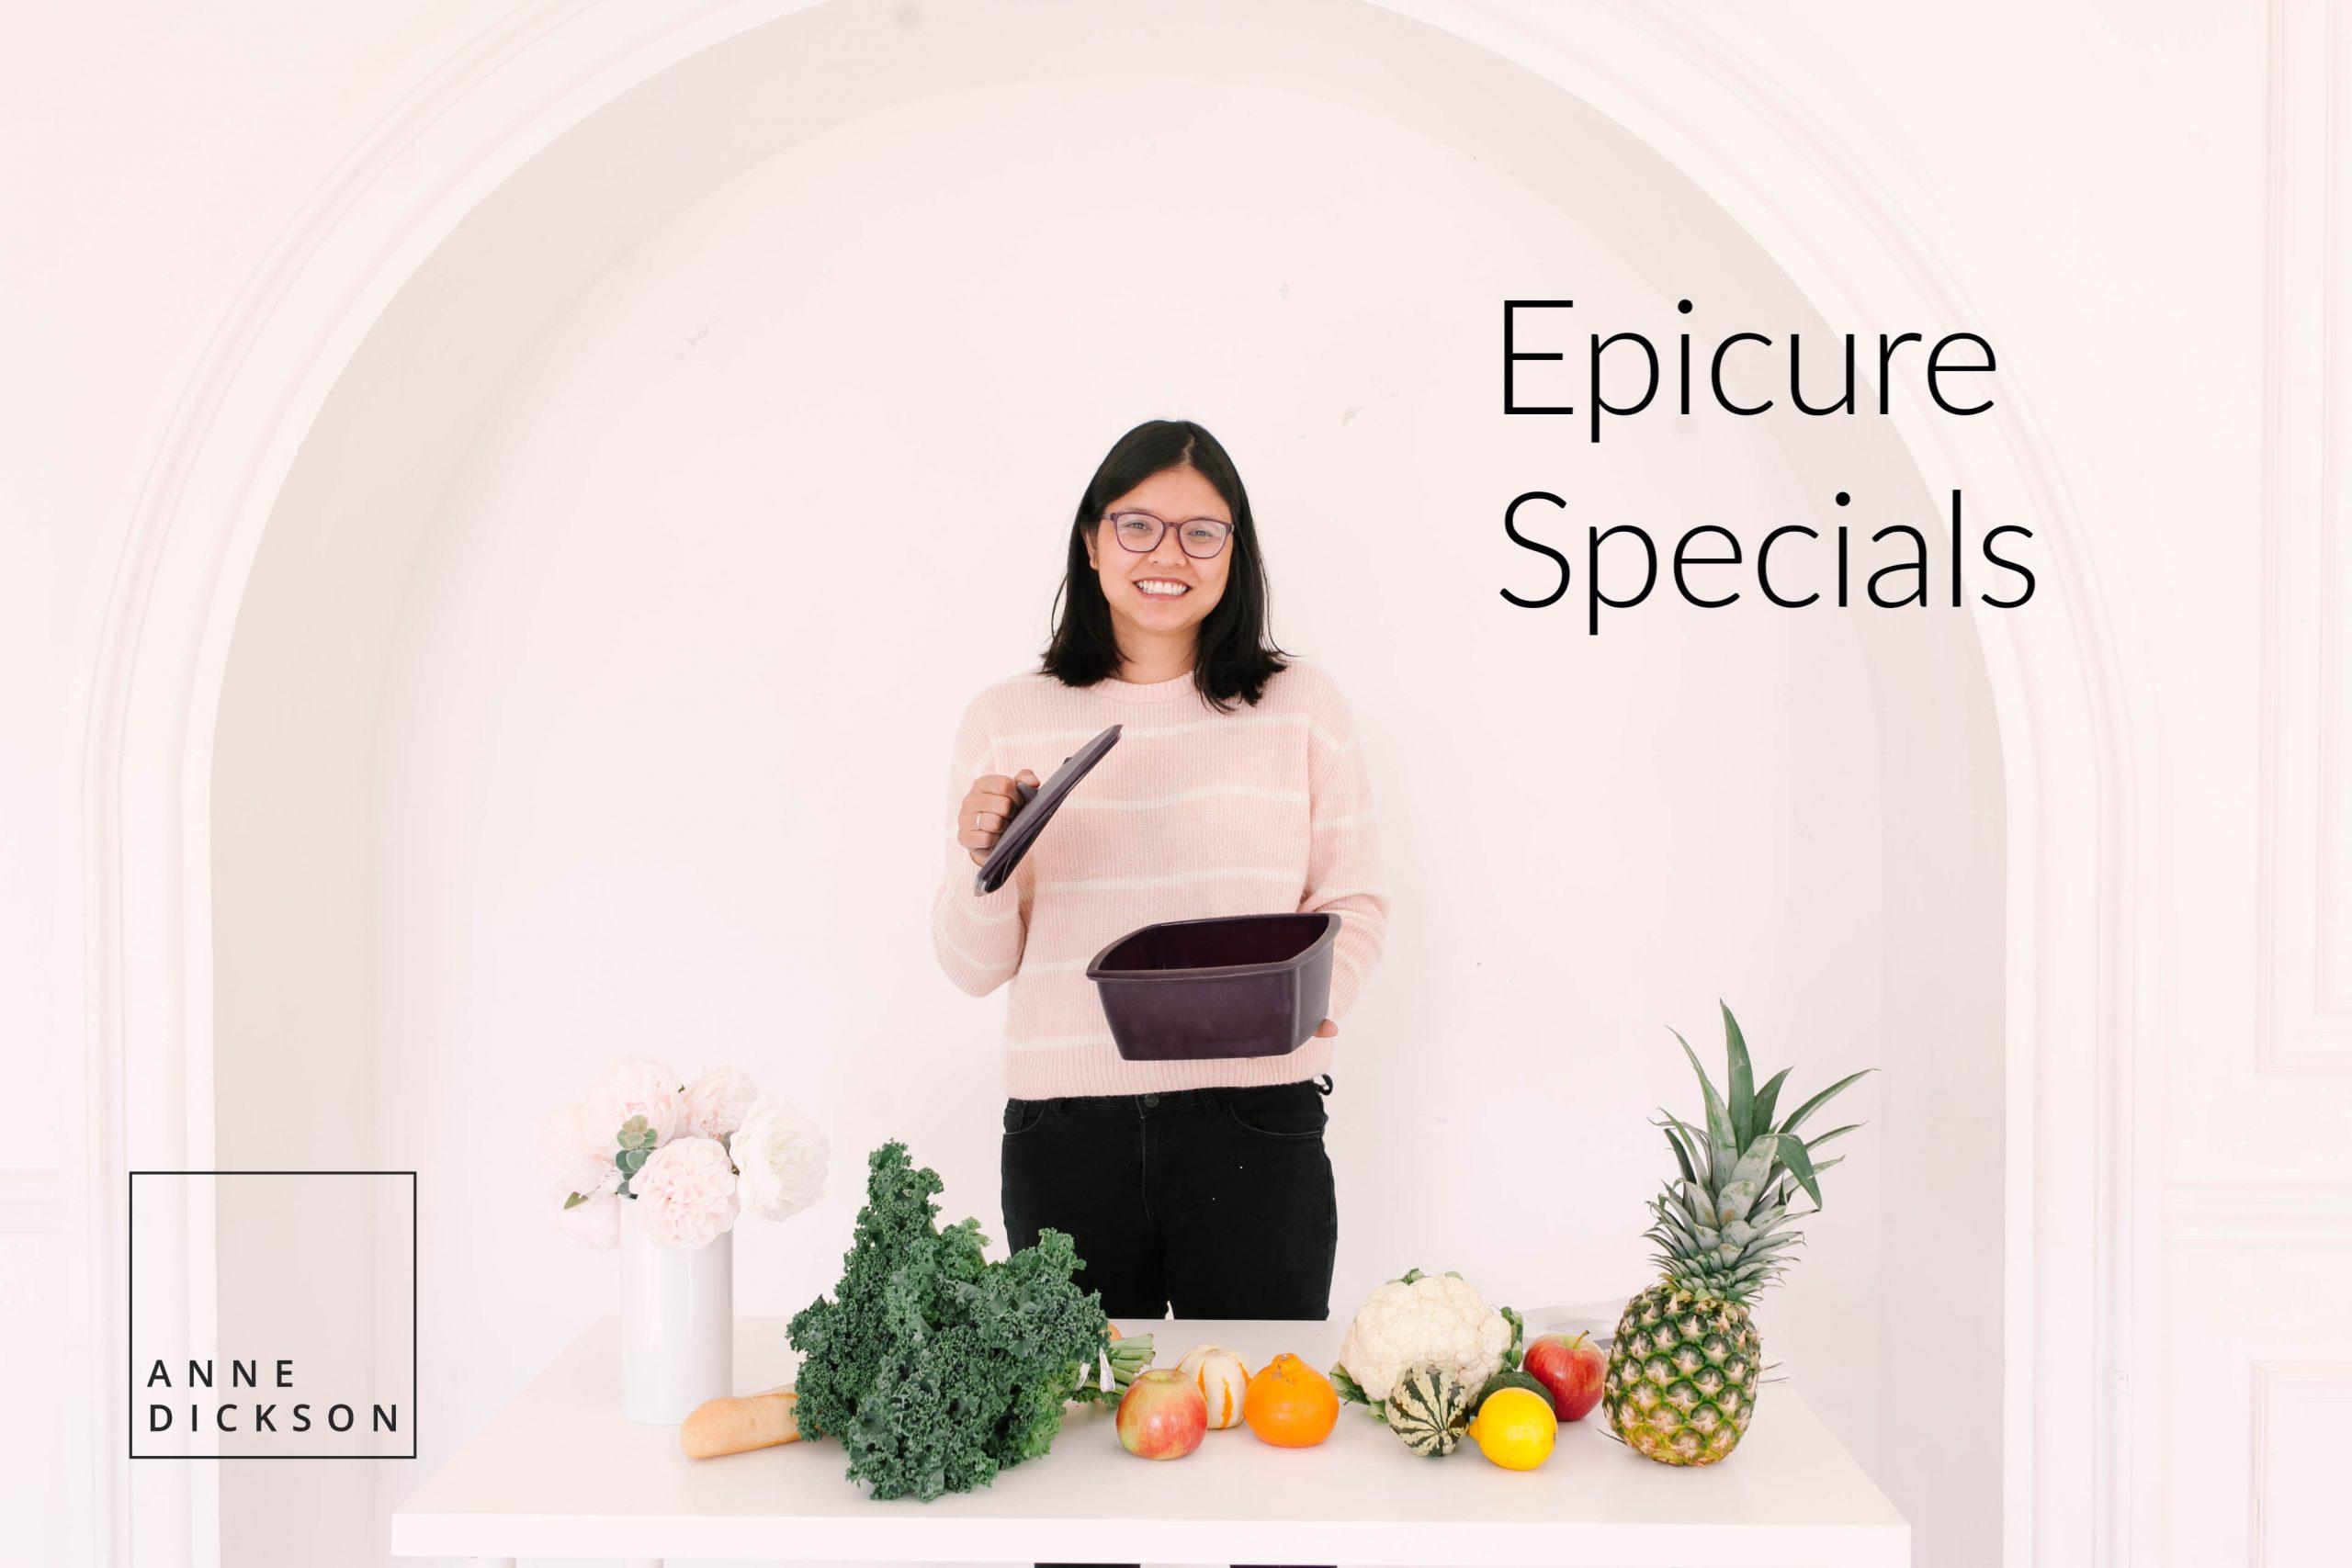 Epicure Specials